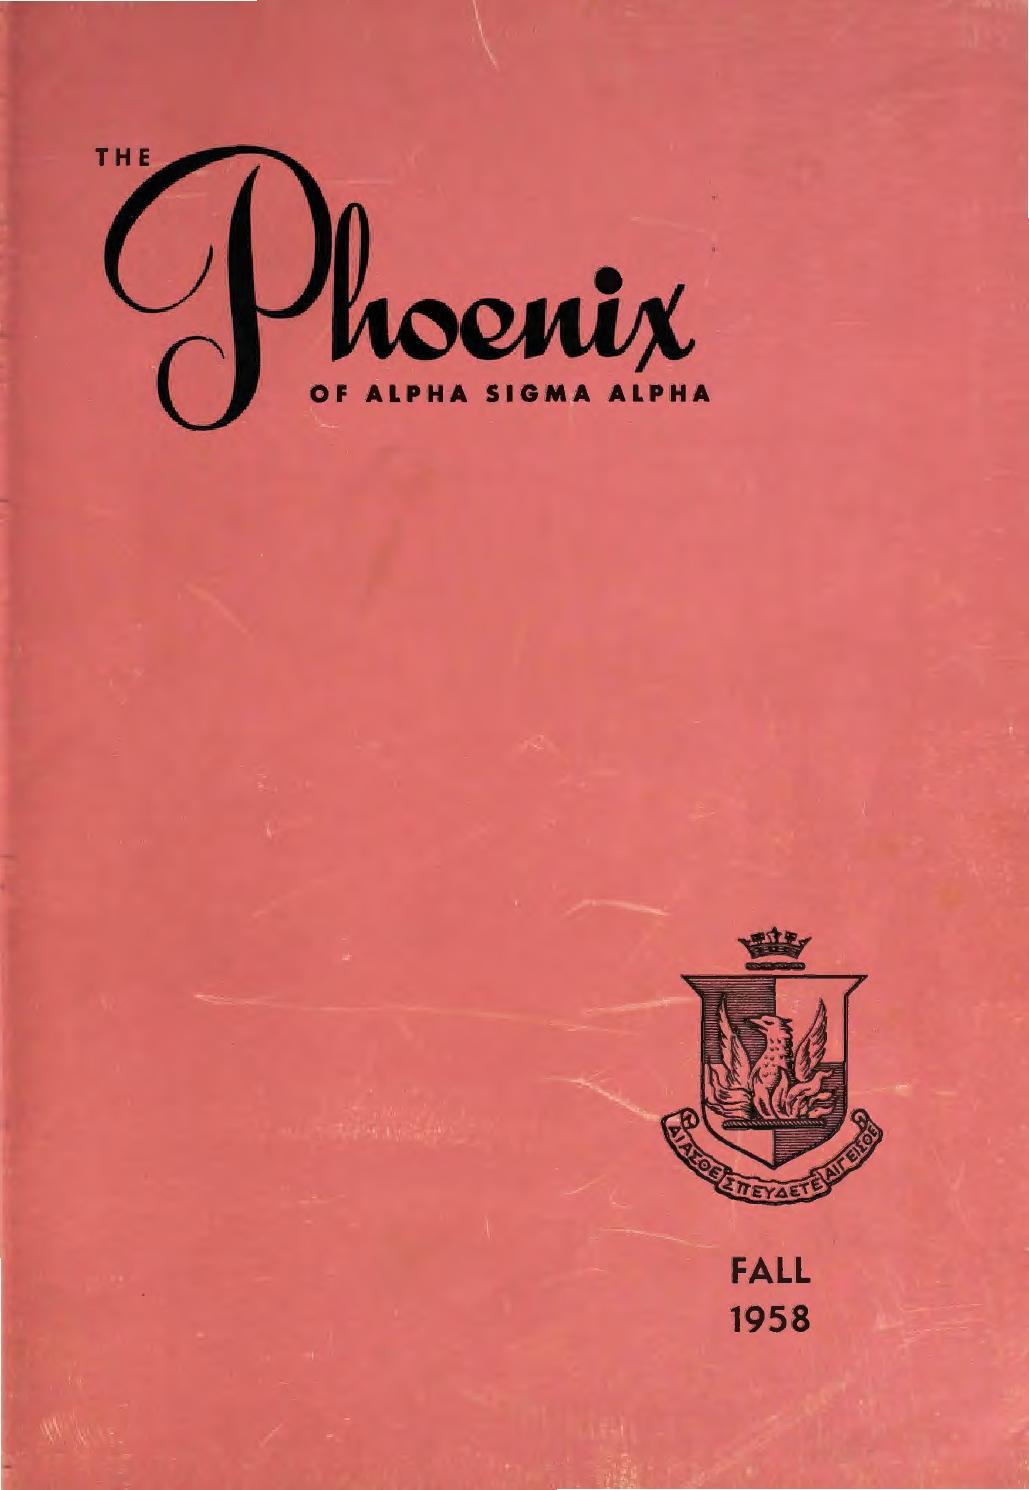 Asa phoenix vol 44 fall 1958 by Alpha Sigma Alpha Sorority